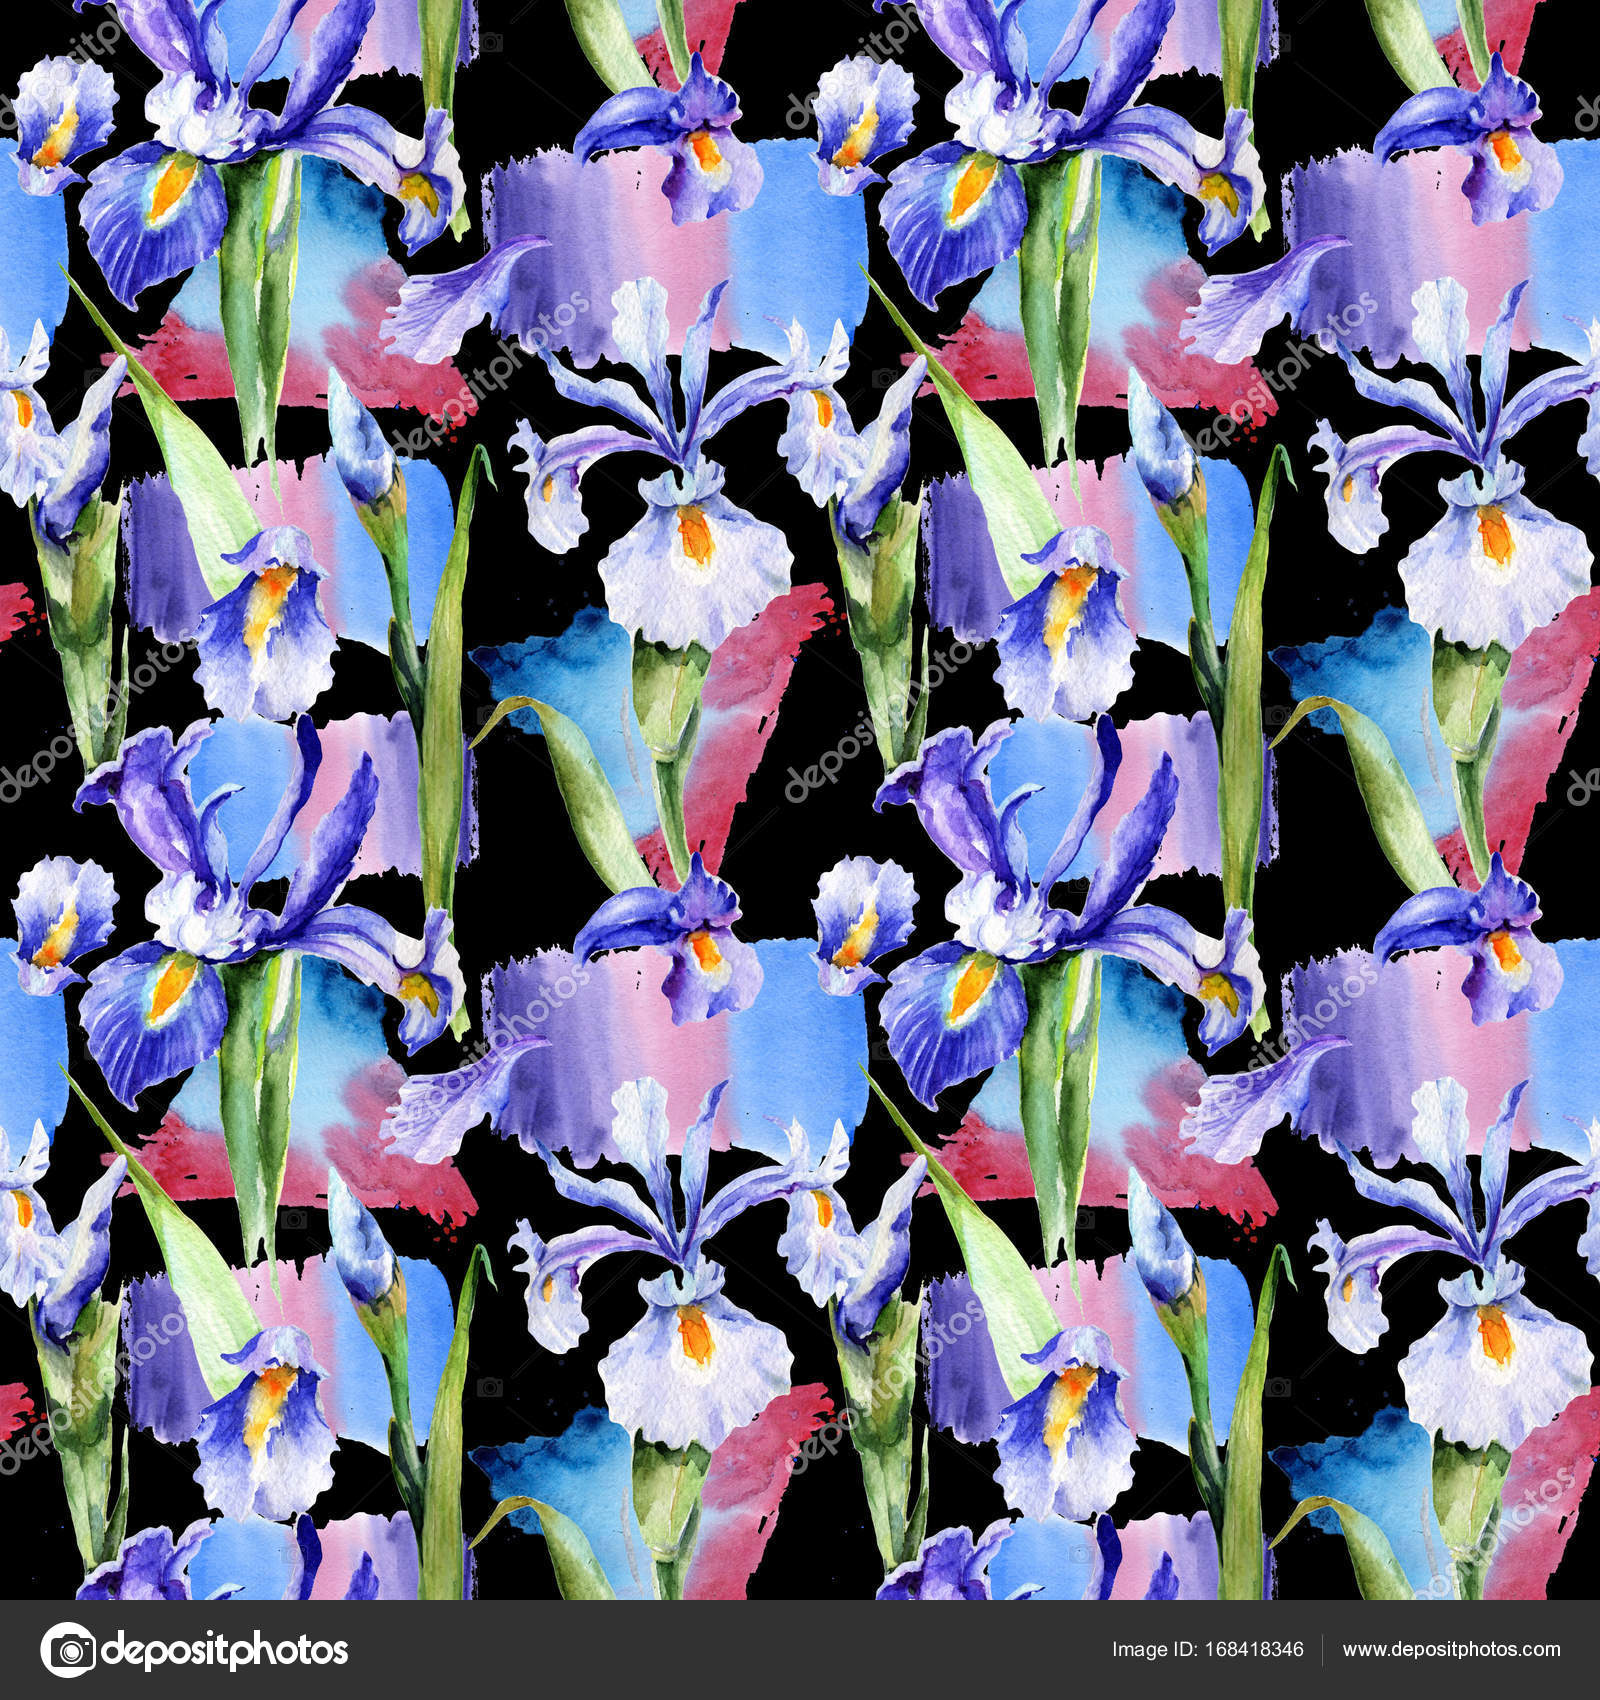 Wildflower Iris Flower Pattern In A Watercolor Style Stock Photo